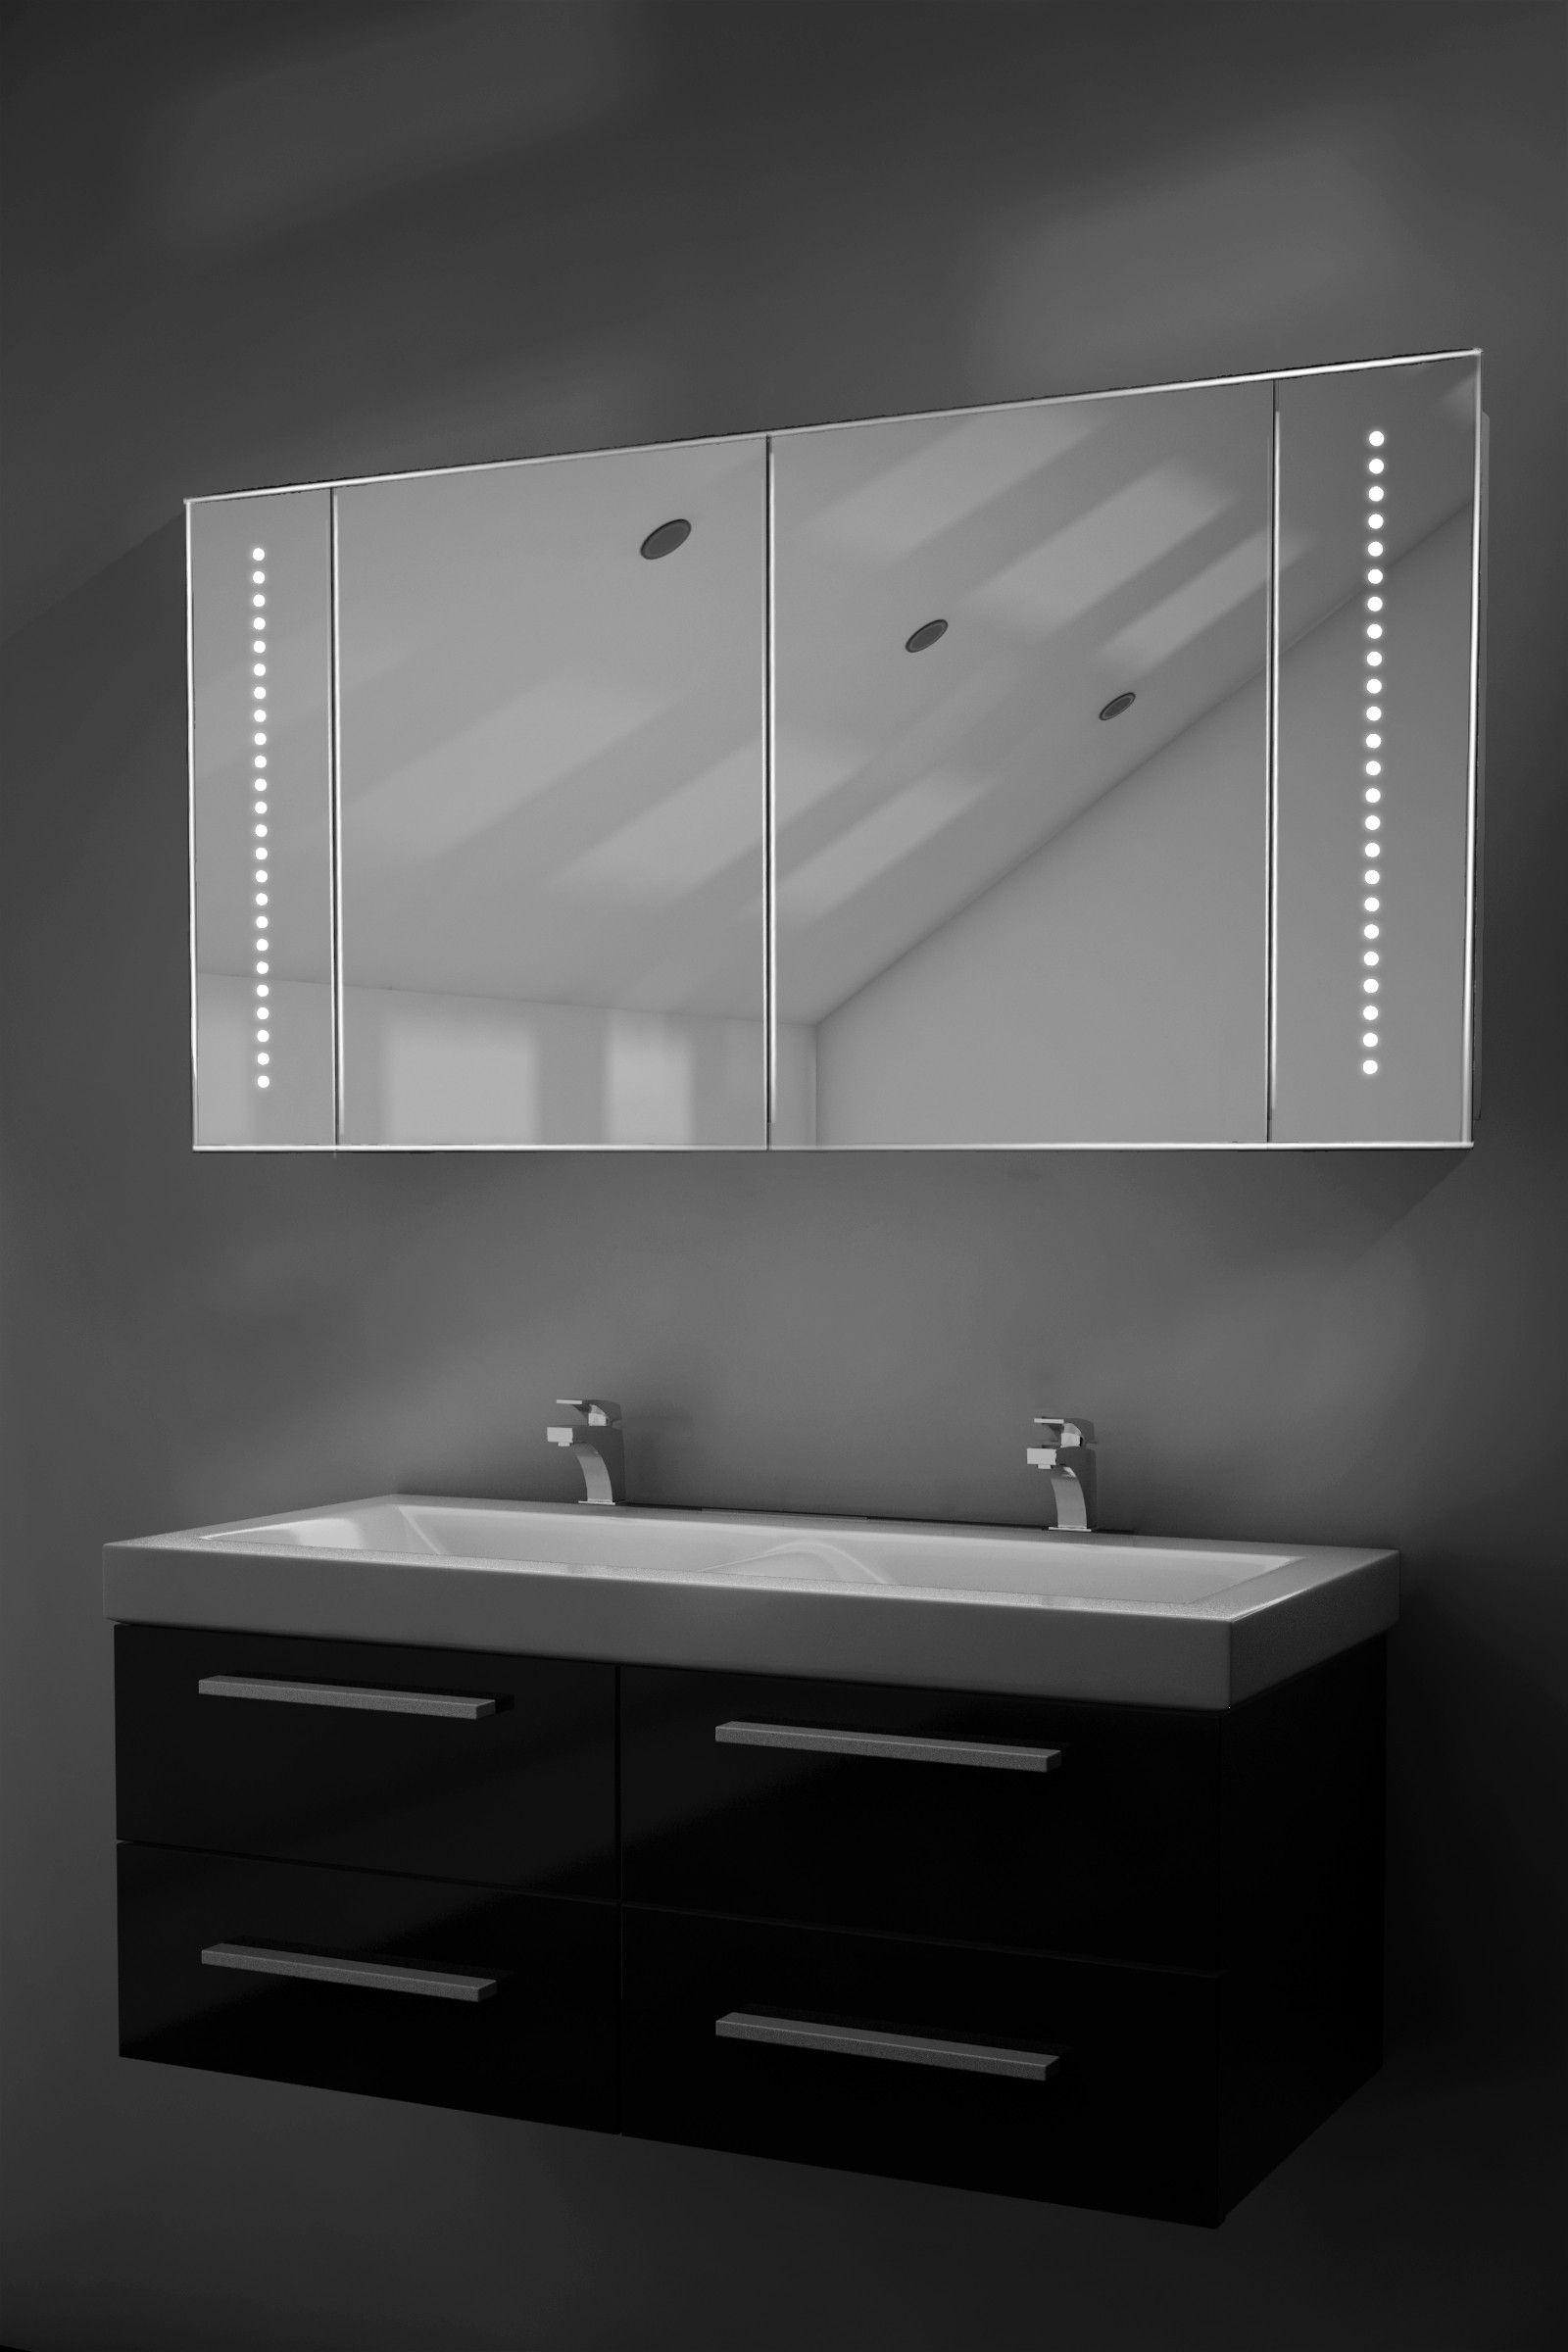 Buy Luxurious Bathroom Mirror Cabinets Led Cabinets At Bathroom Cabinet World Mirror Cabinets